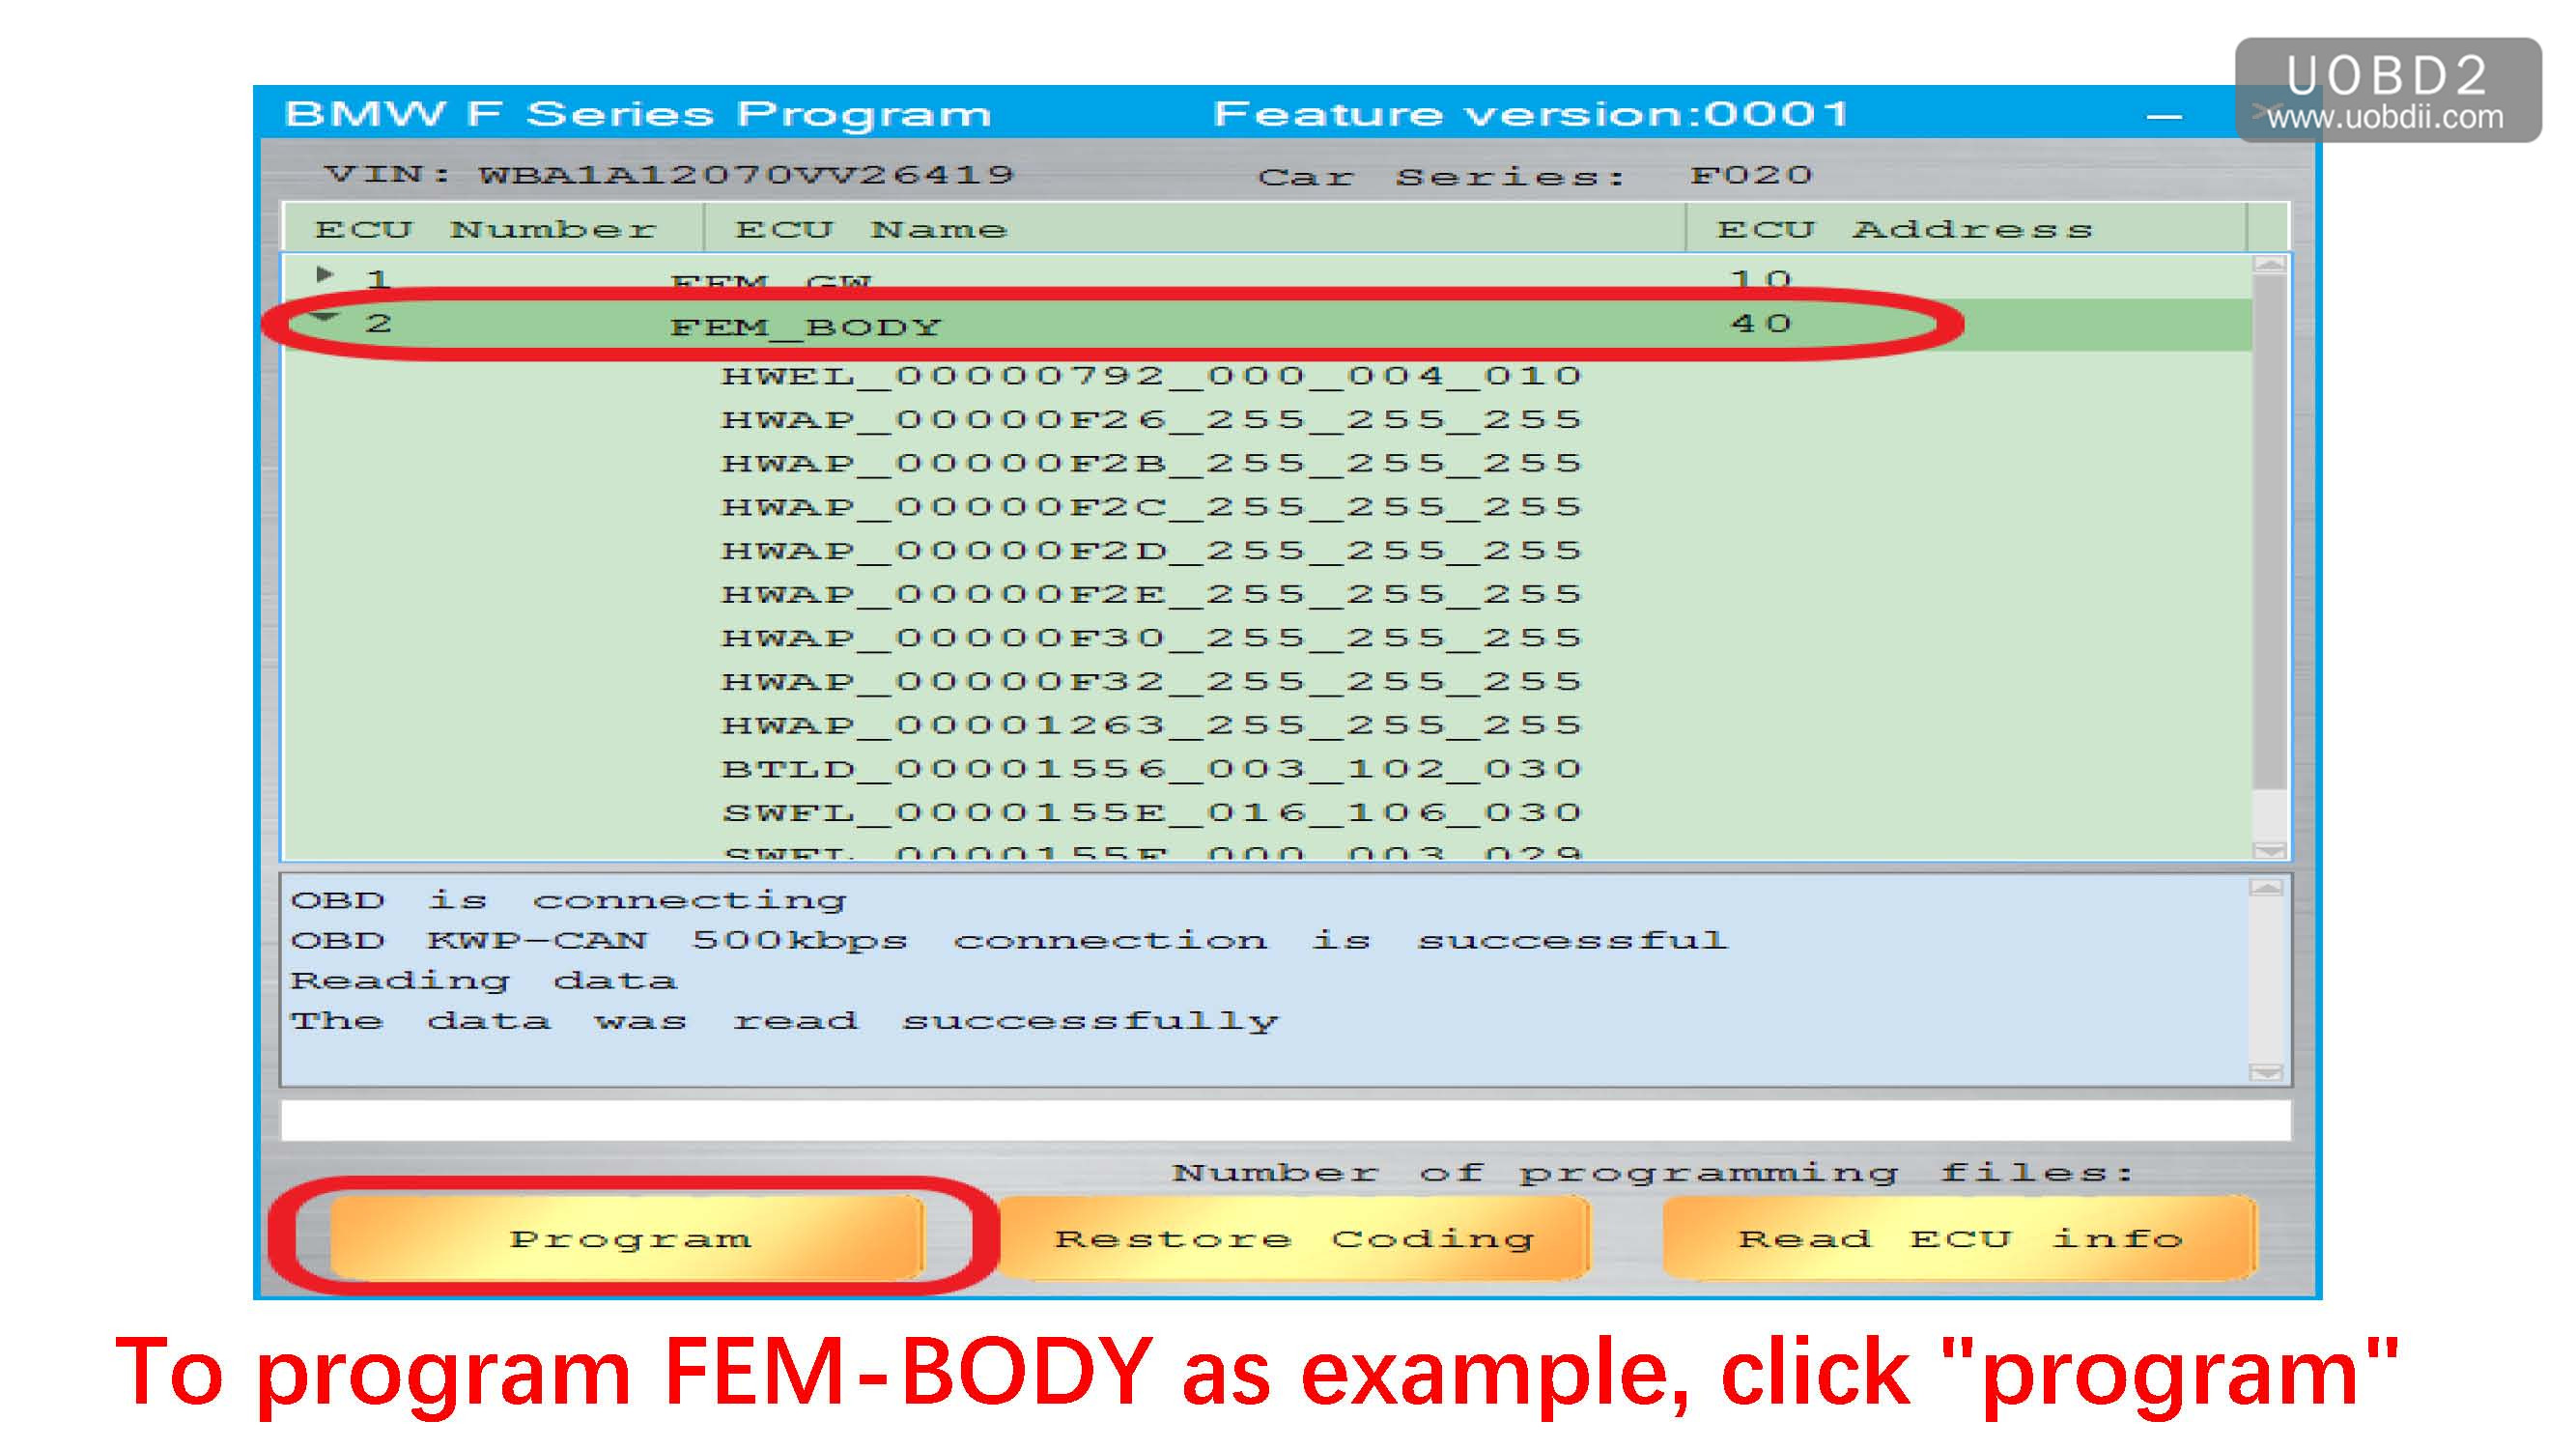 cgdi-pro-bmw-f-series-program-03